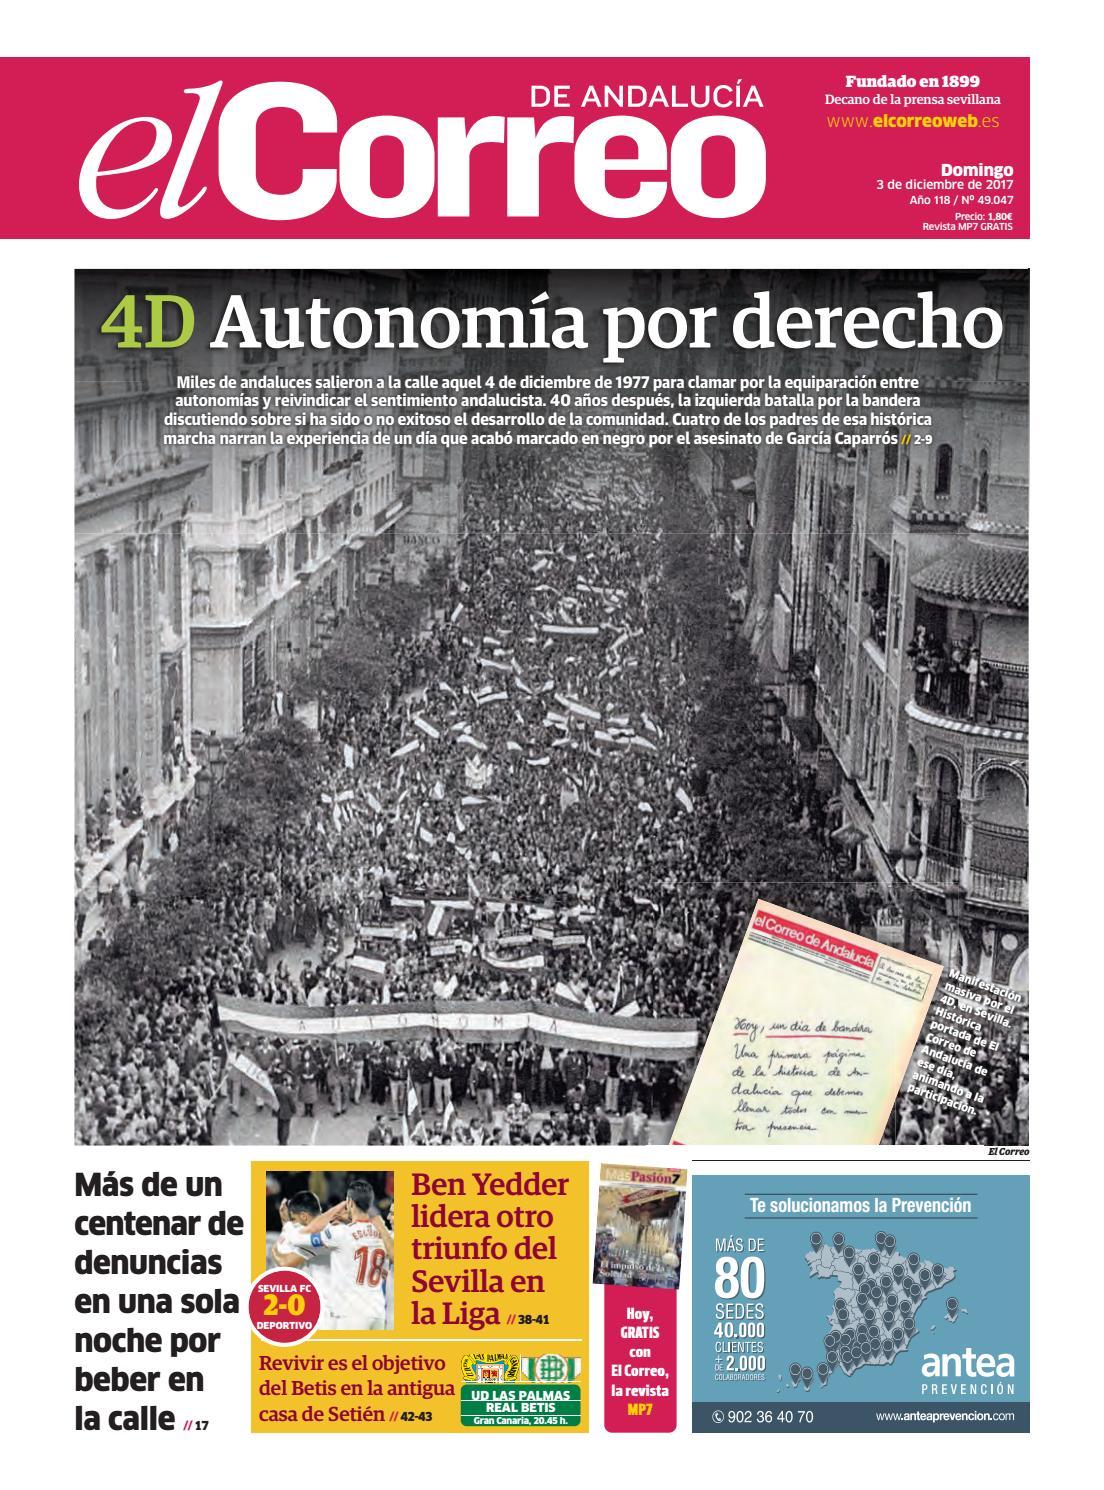 03 12 2017 El Correo De Andaluc A By El Correo De Andaluc A S L  # Muebles Caparros E Hijos